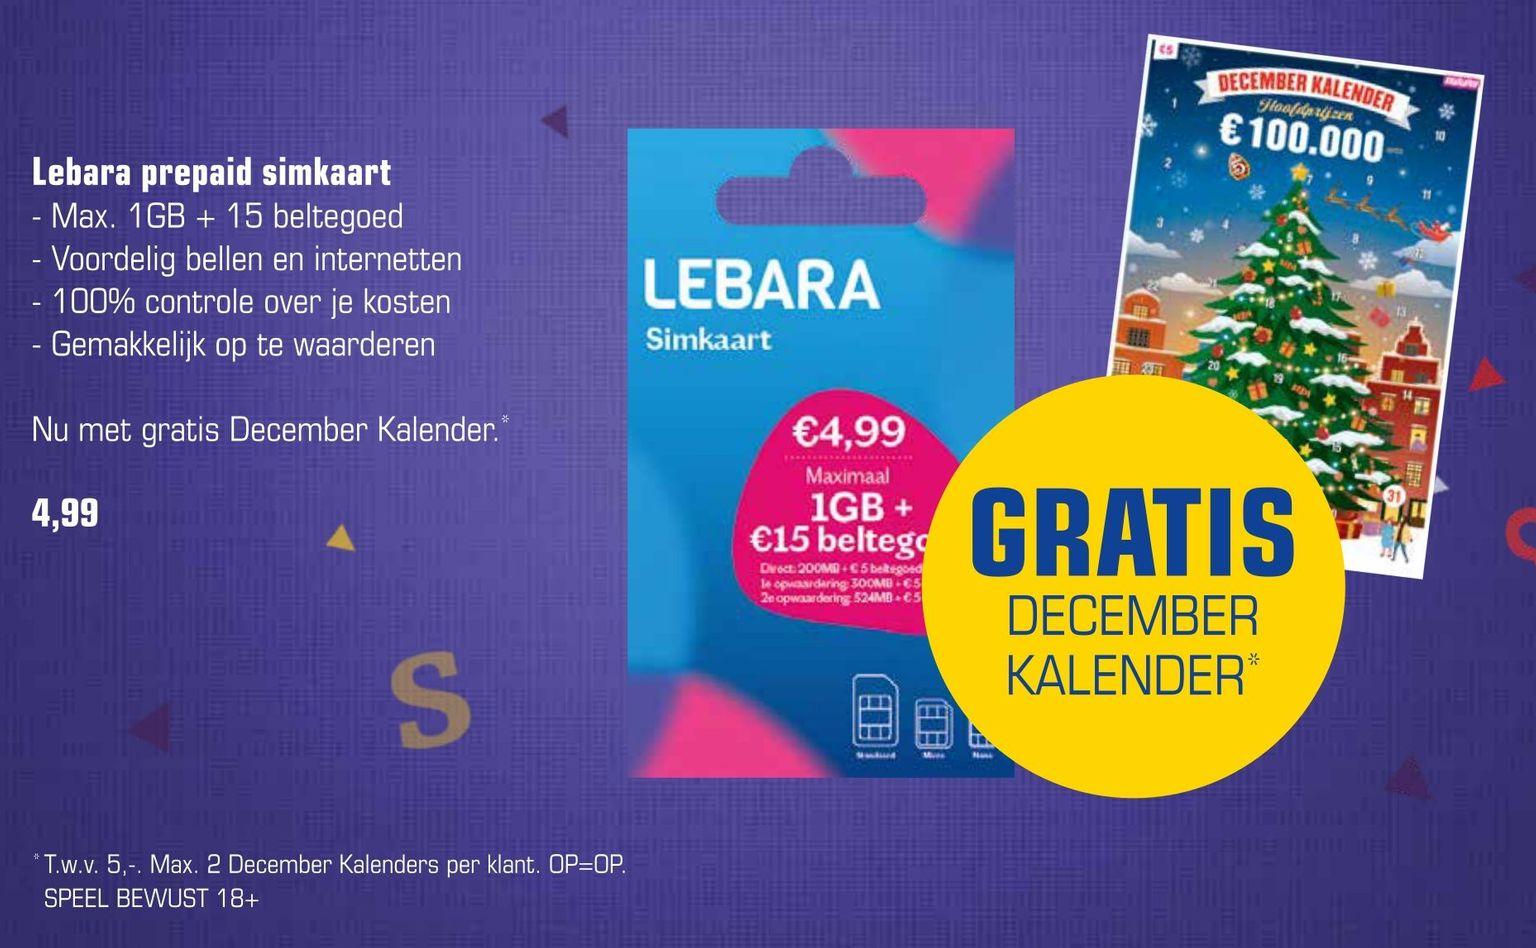 Gratis december kraskalender bij Lebara prepaid simkaart